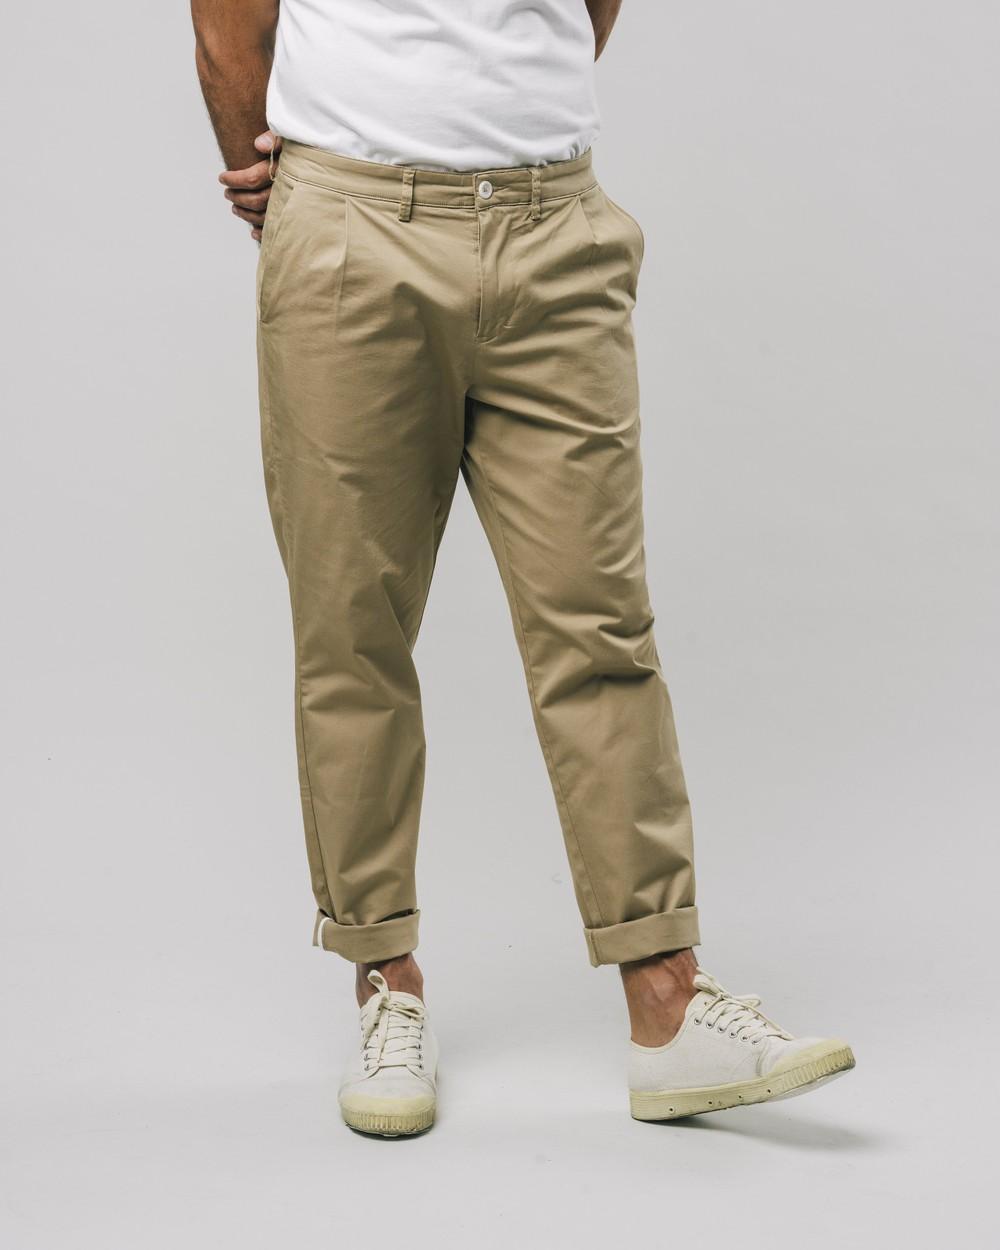 Pleated chino pants beige - Brava Fabrics